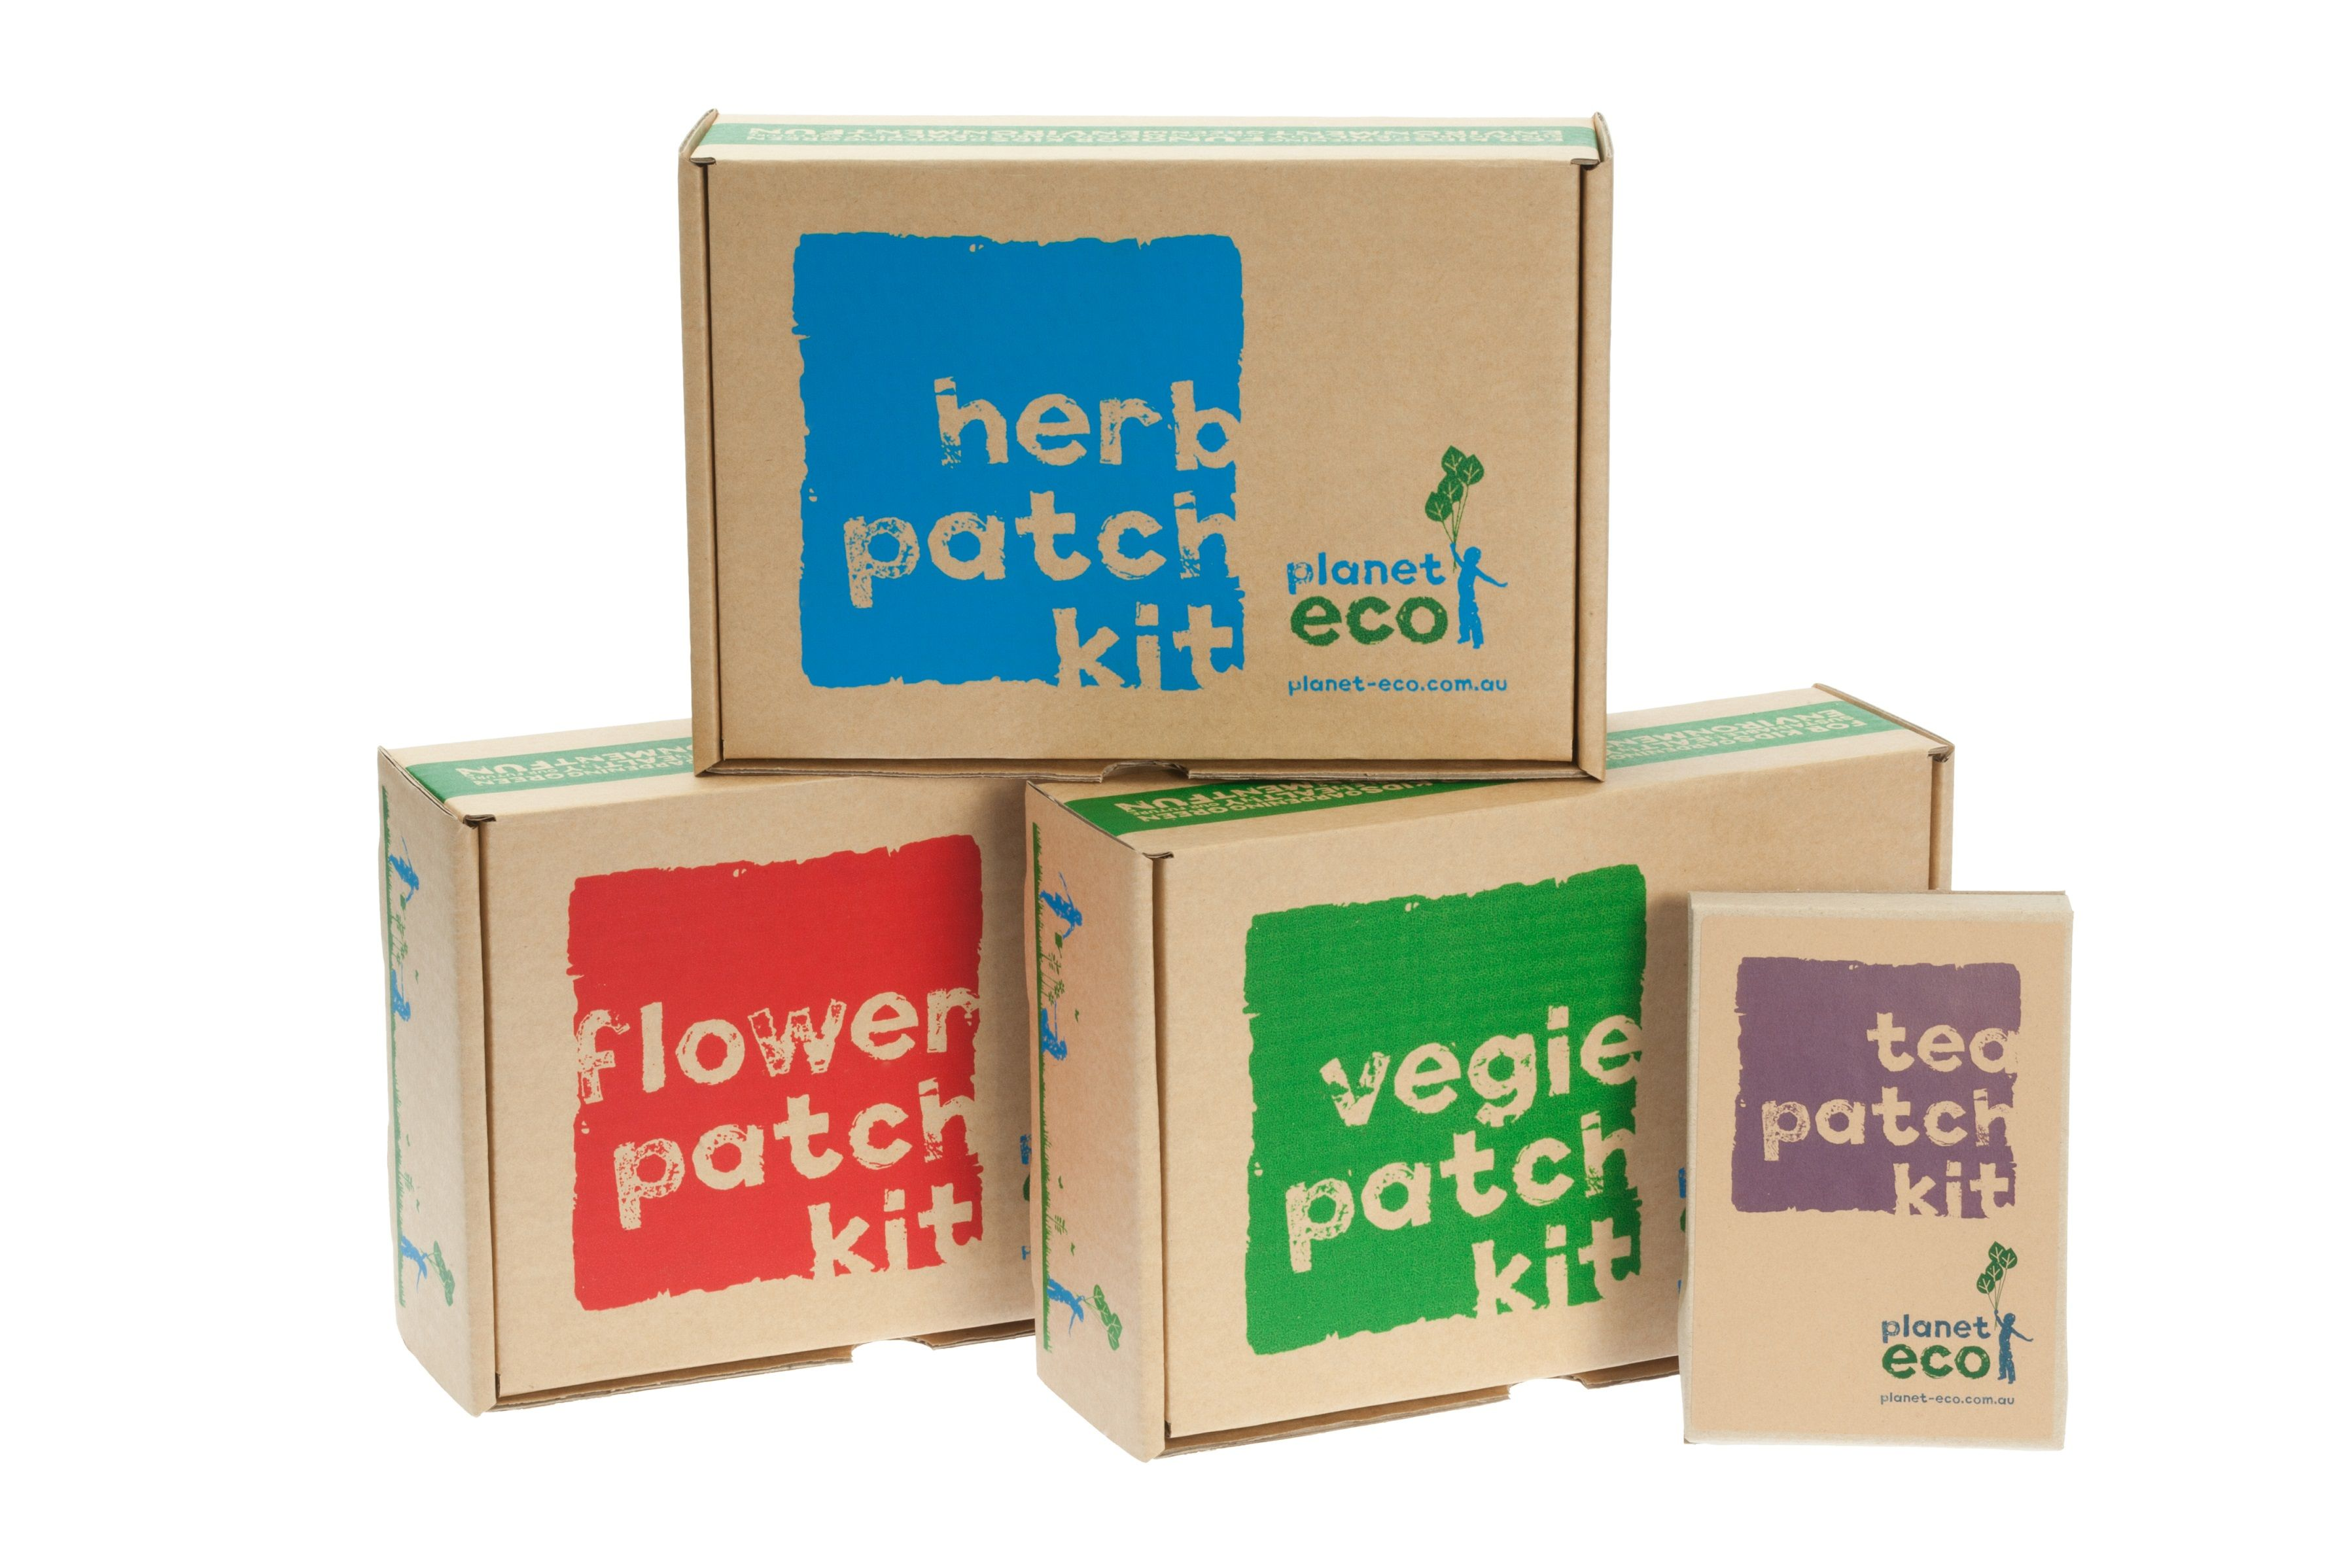 Vegie, Herb, Flower and Tea Patch Kits Gardening kits